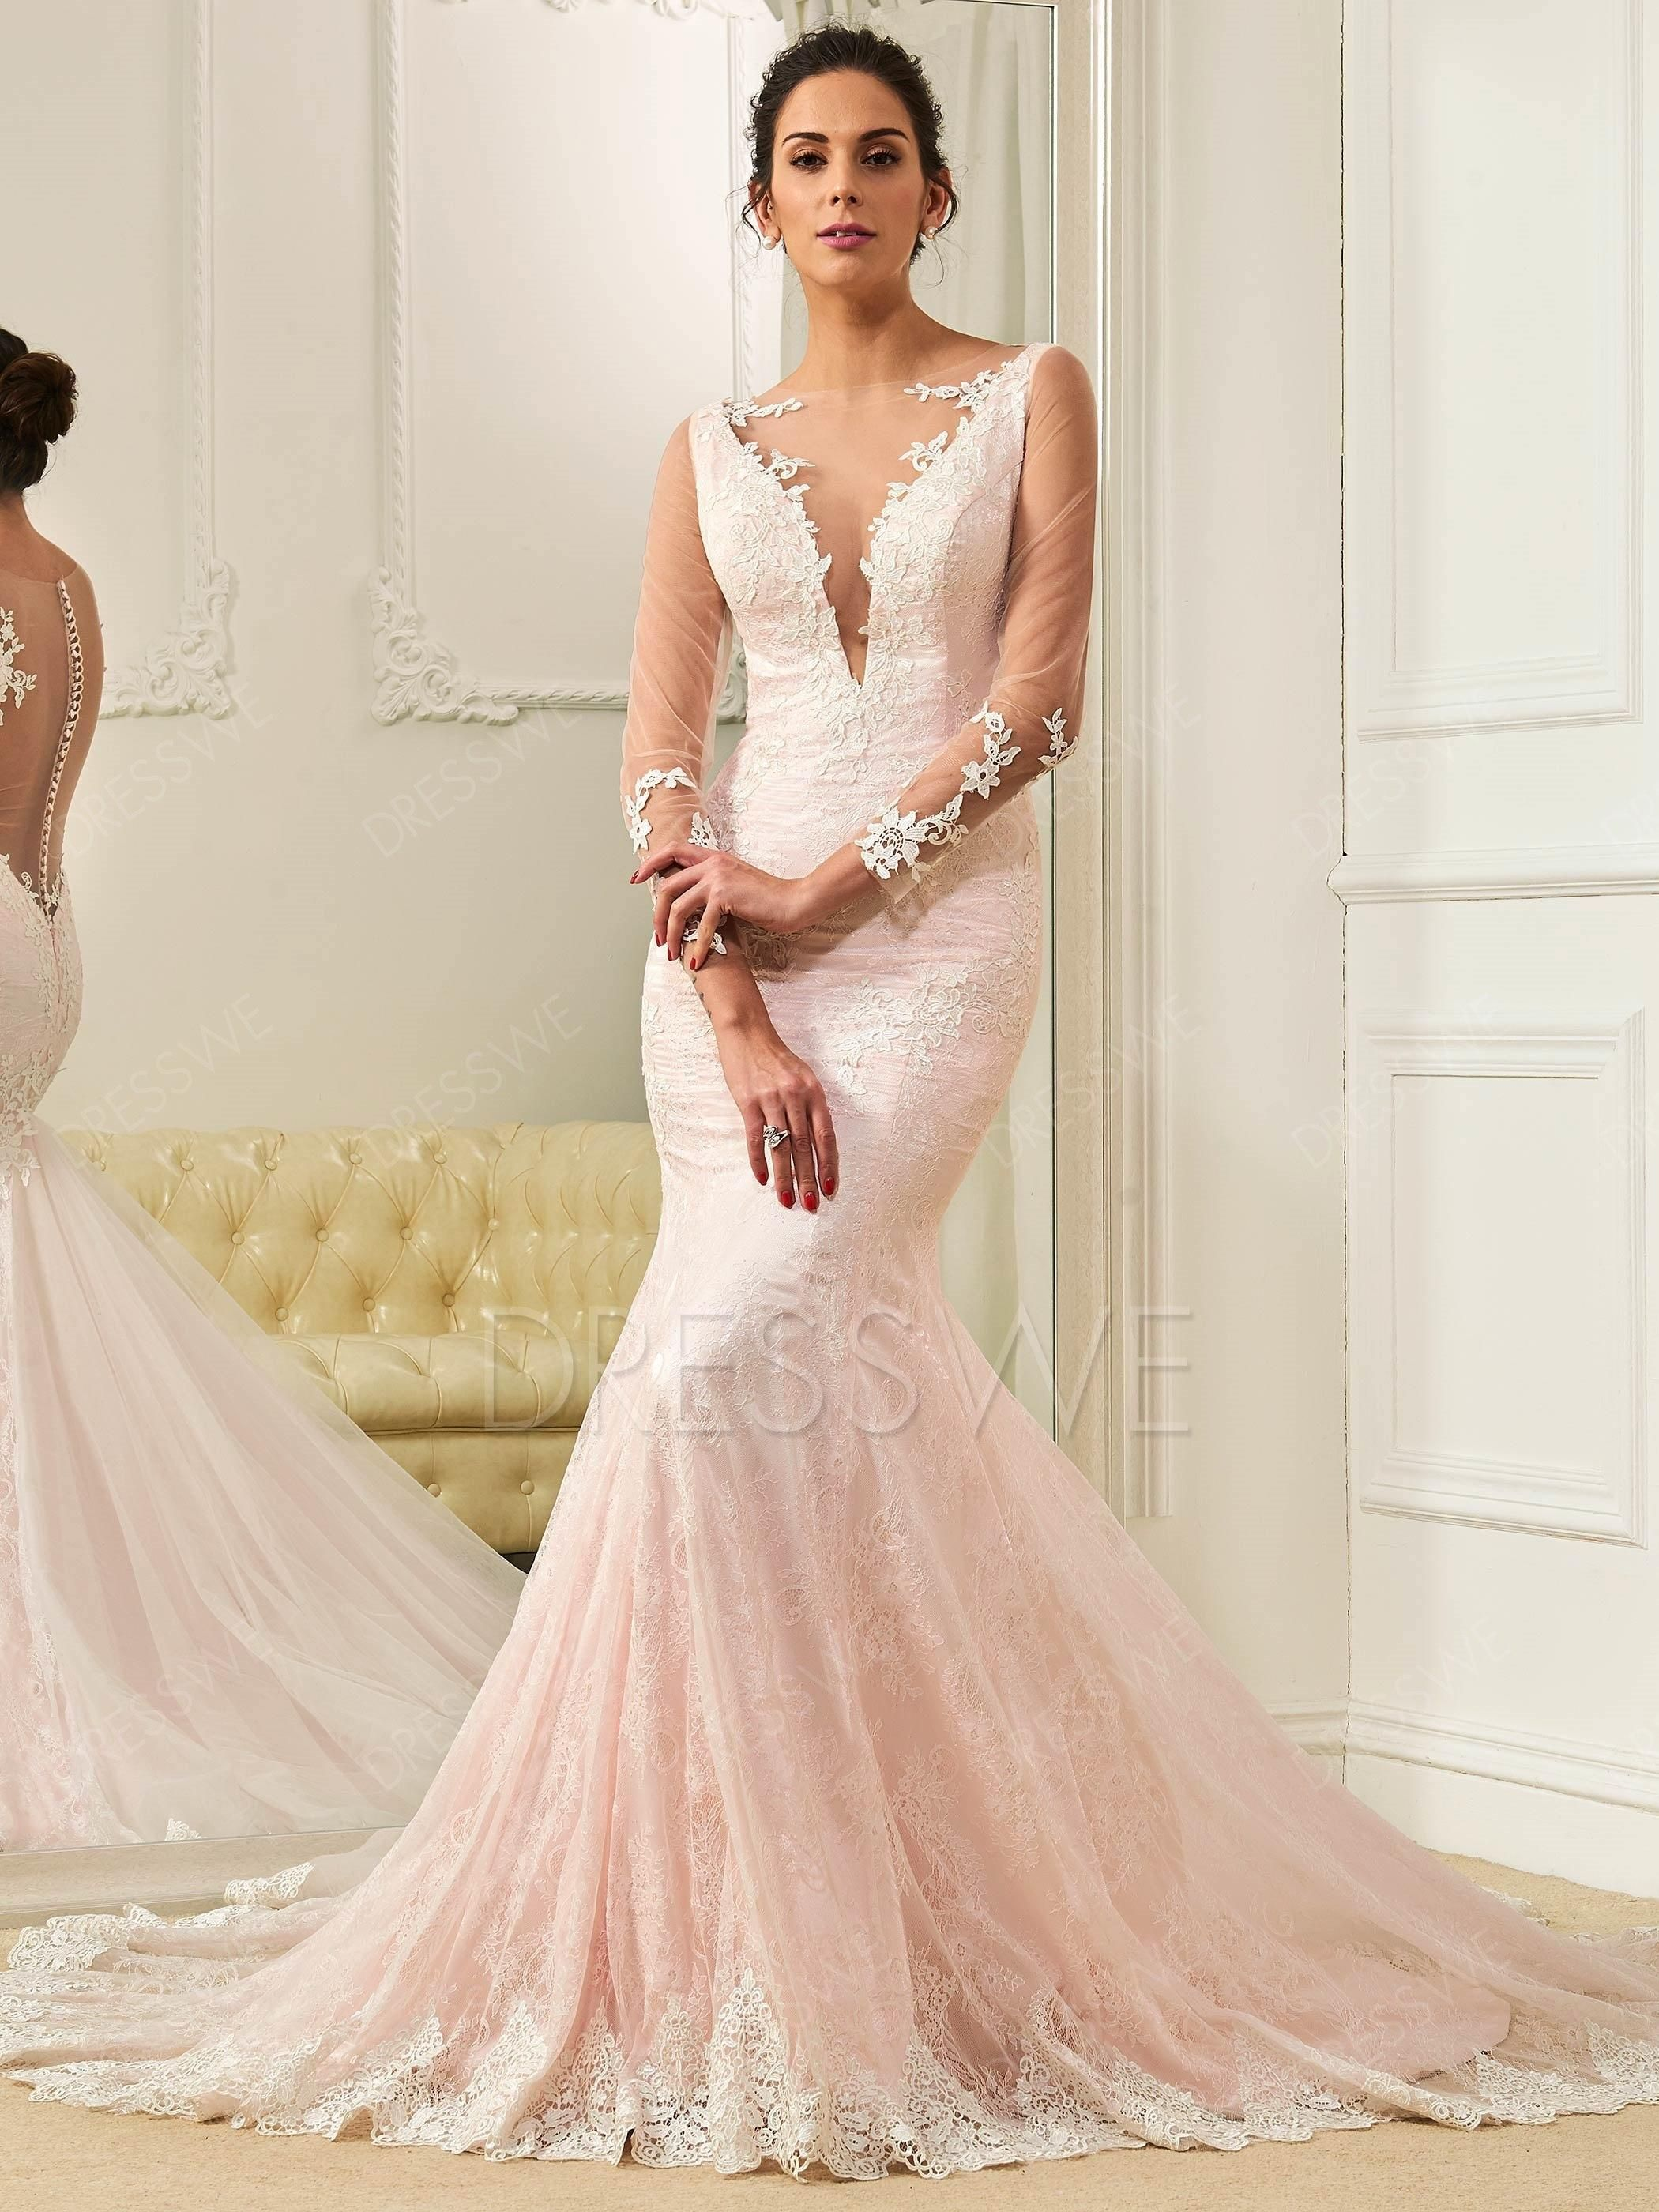 28ac572e482  AdoreWe  DressWe Womens - DressWe Long Sleeves Lace Appliques Button  Mermaid Pink Wedding Dress - AdoreWe.com